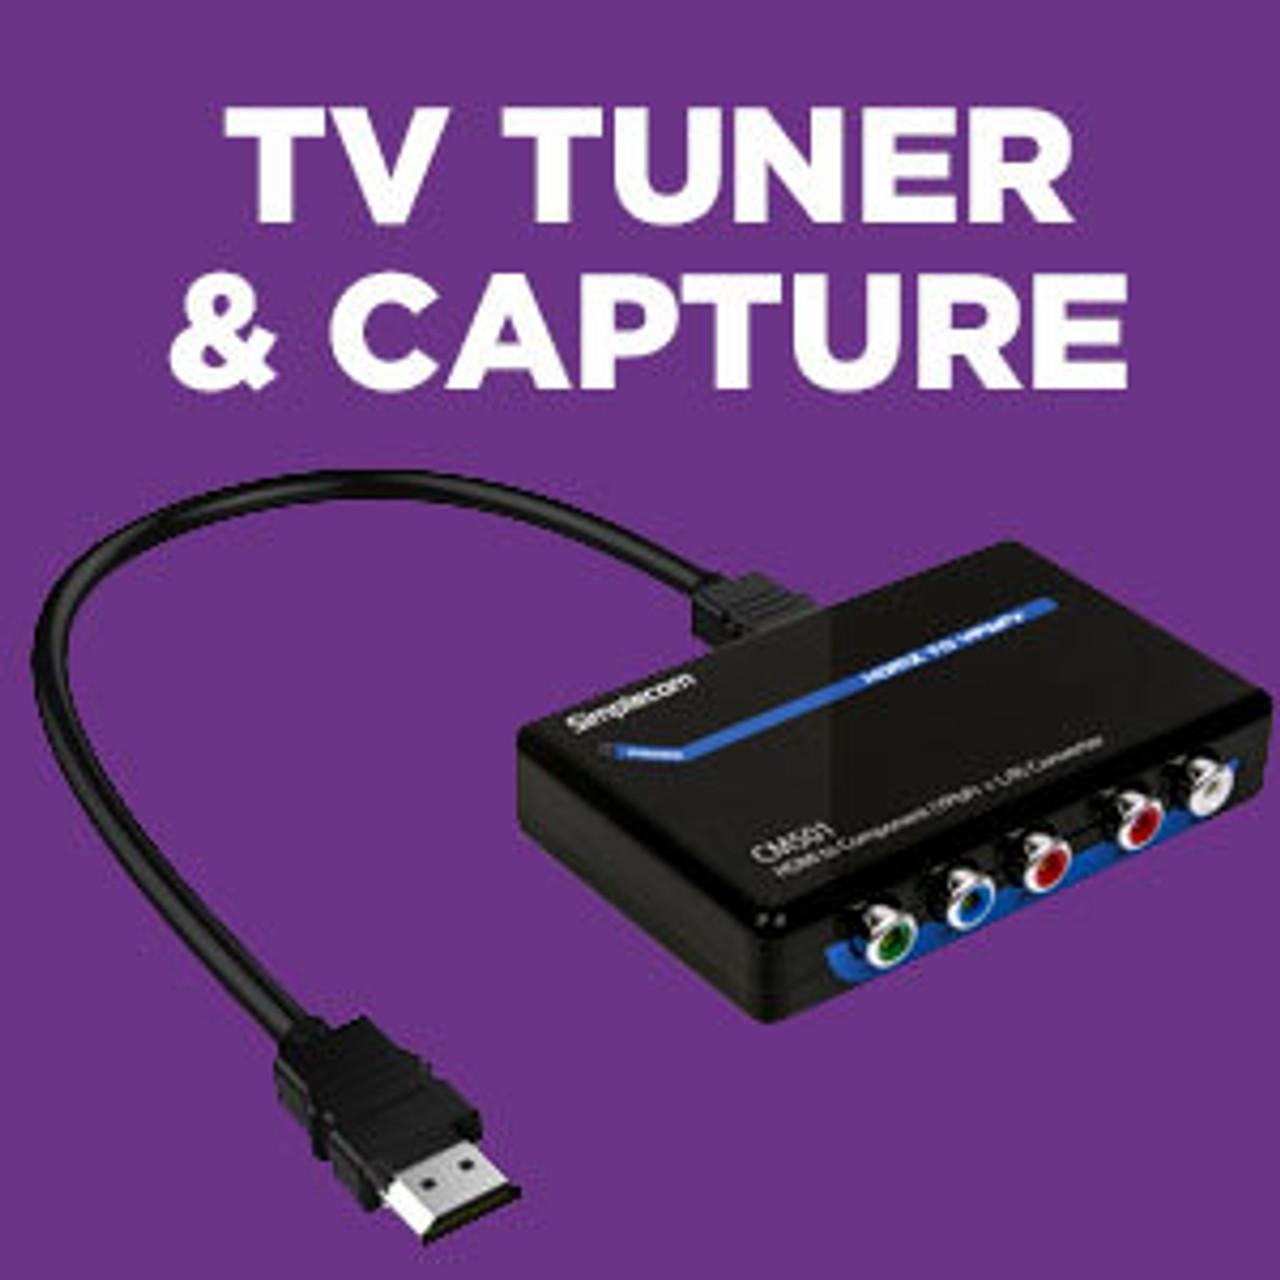 TV Tuner & Capture